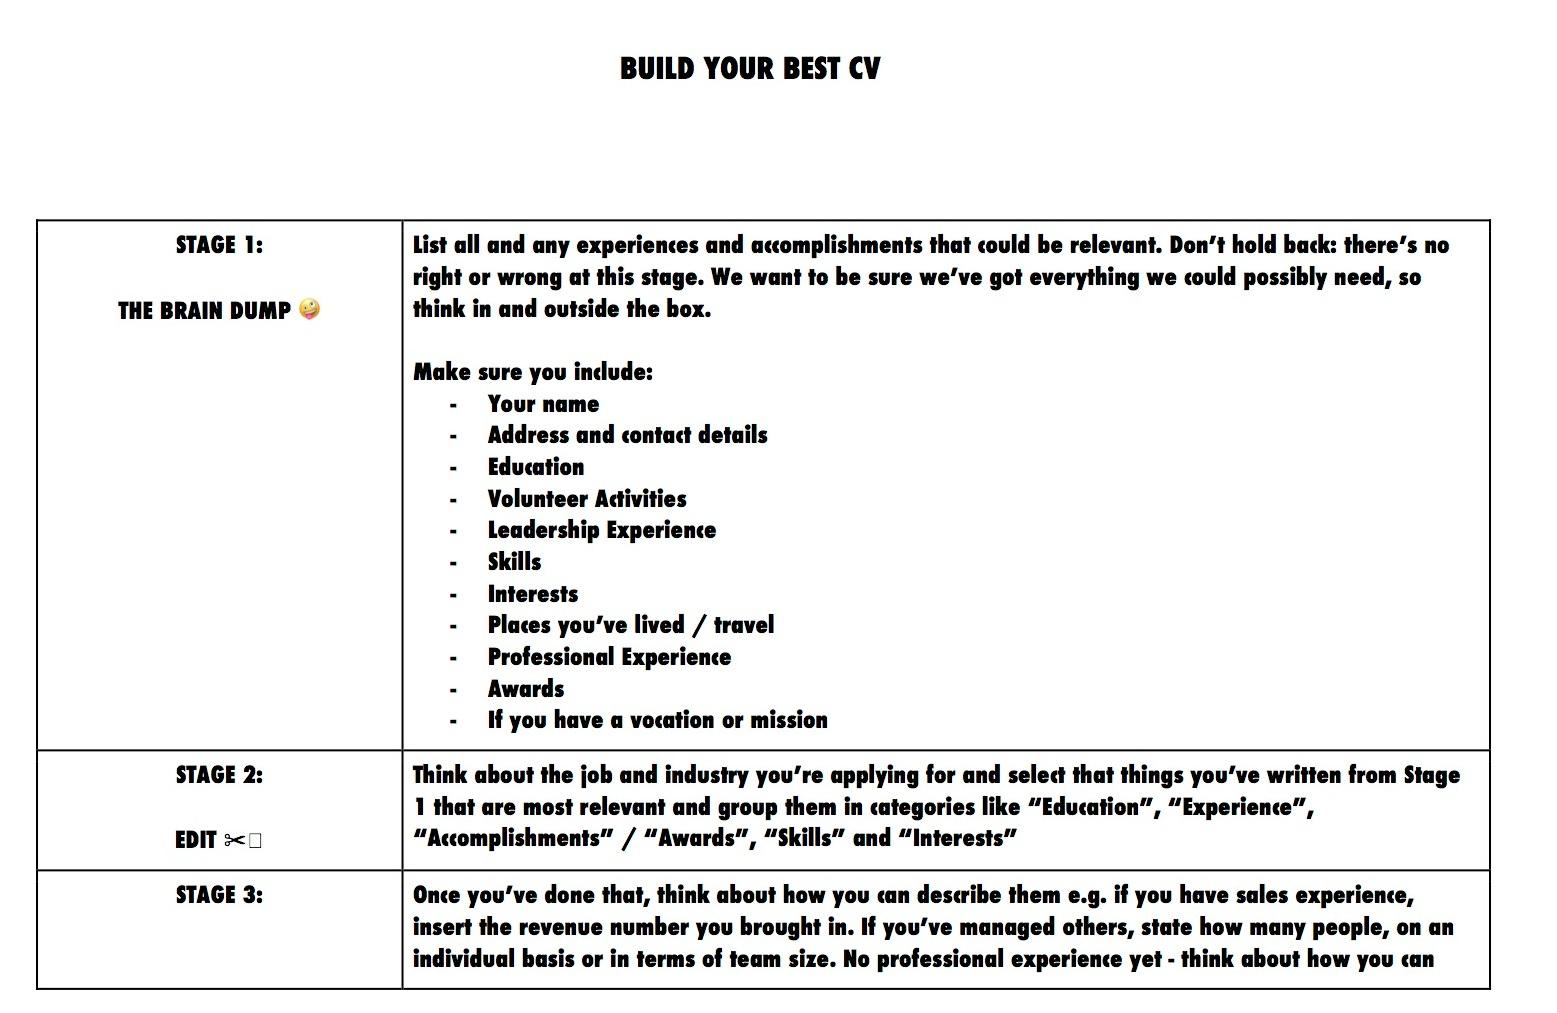 BUILD YOUR BEST CV.jpg